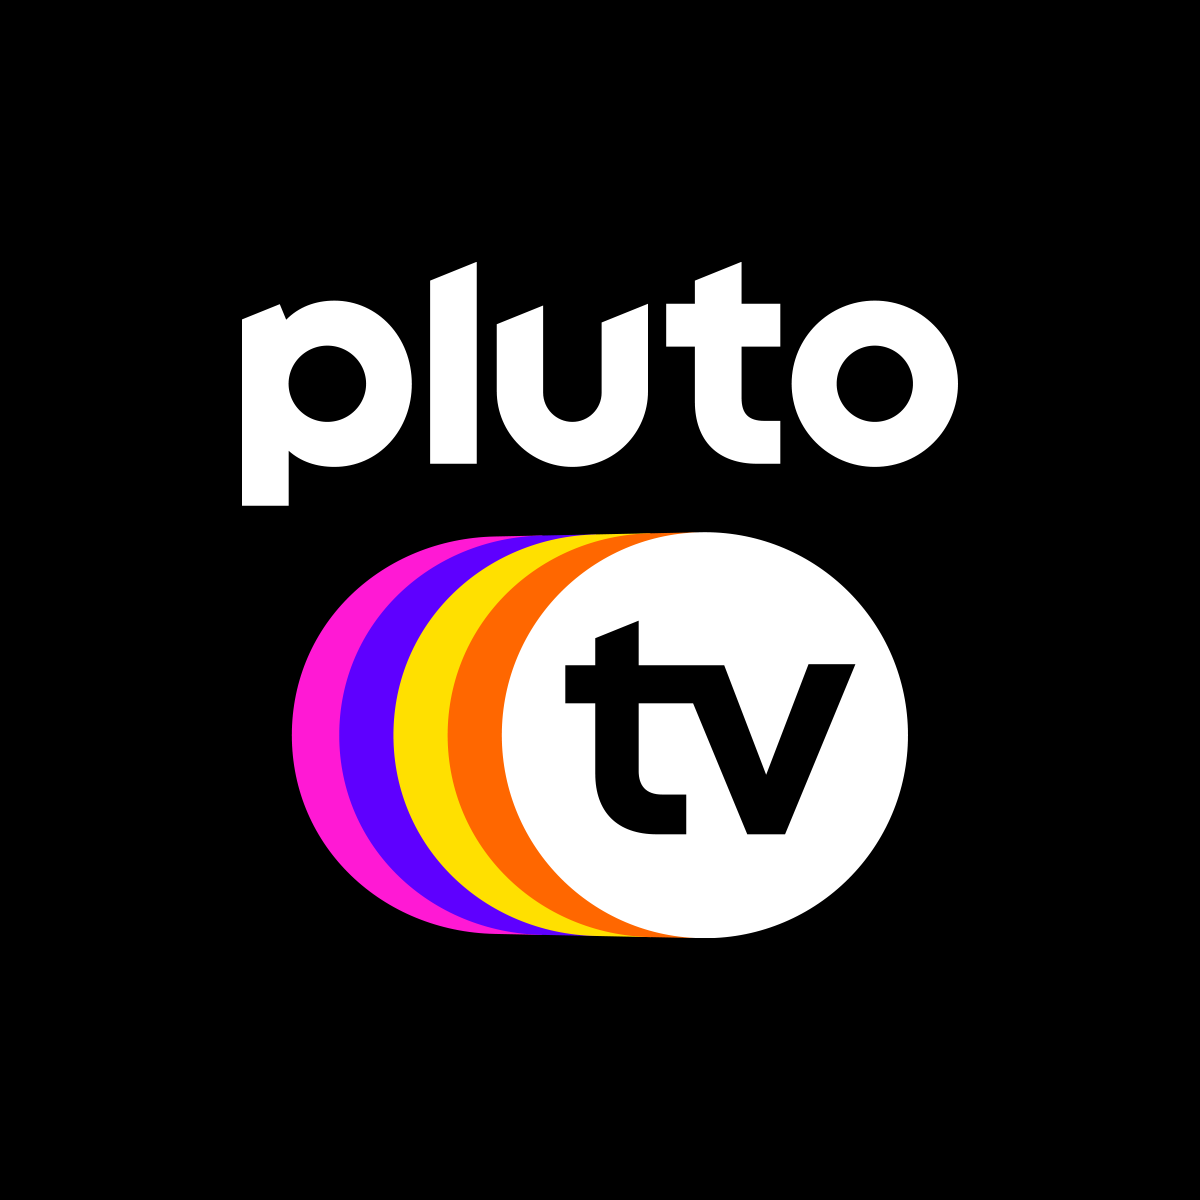 Nick Jr. Pluto TV on Pluto TV